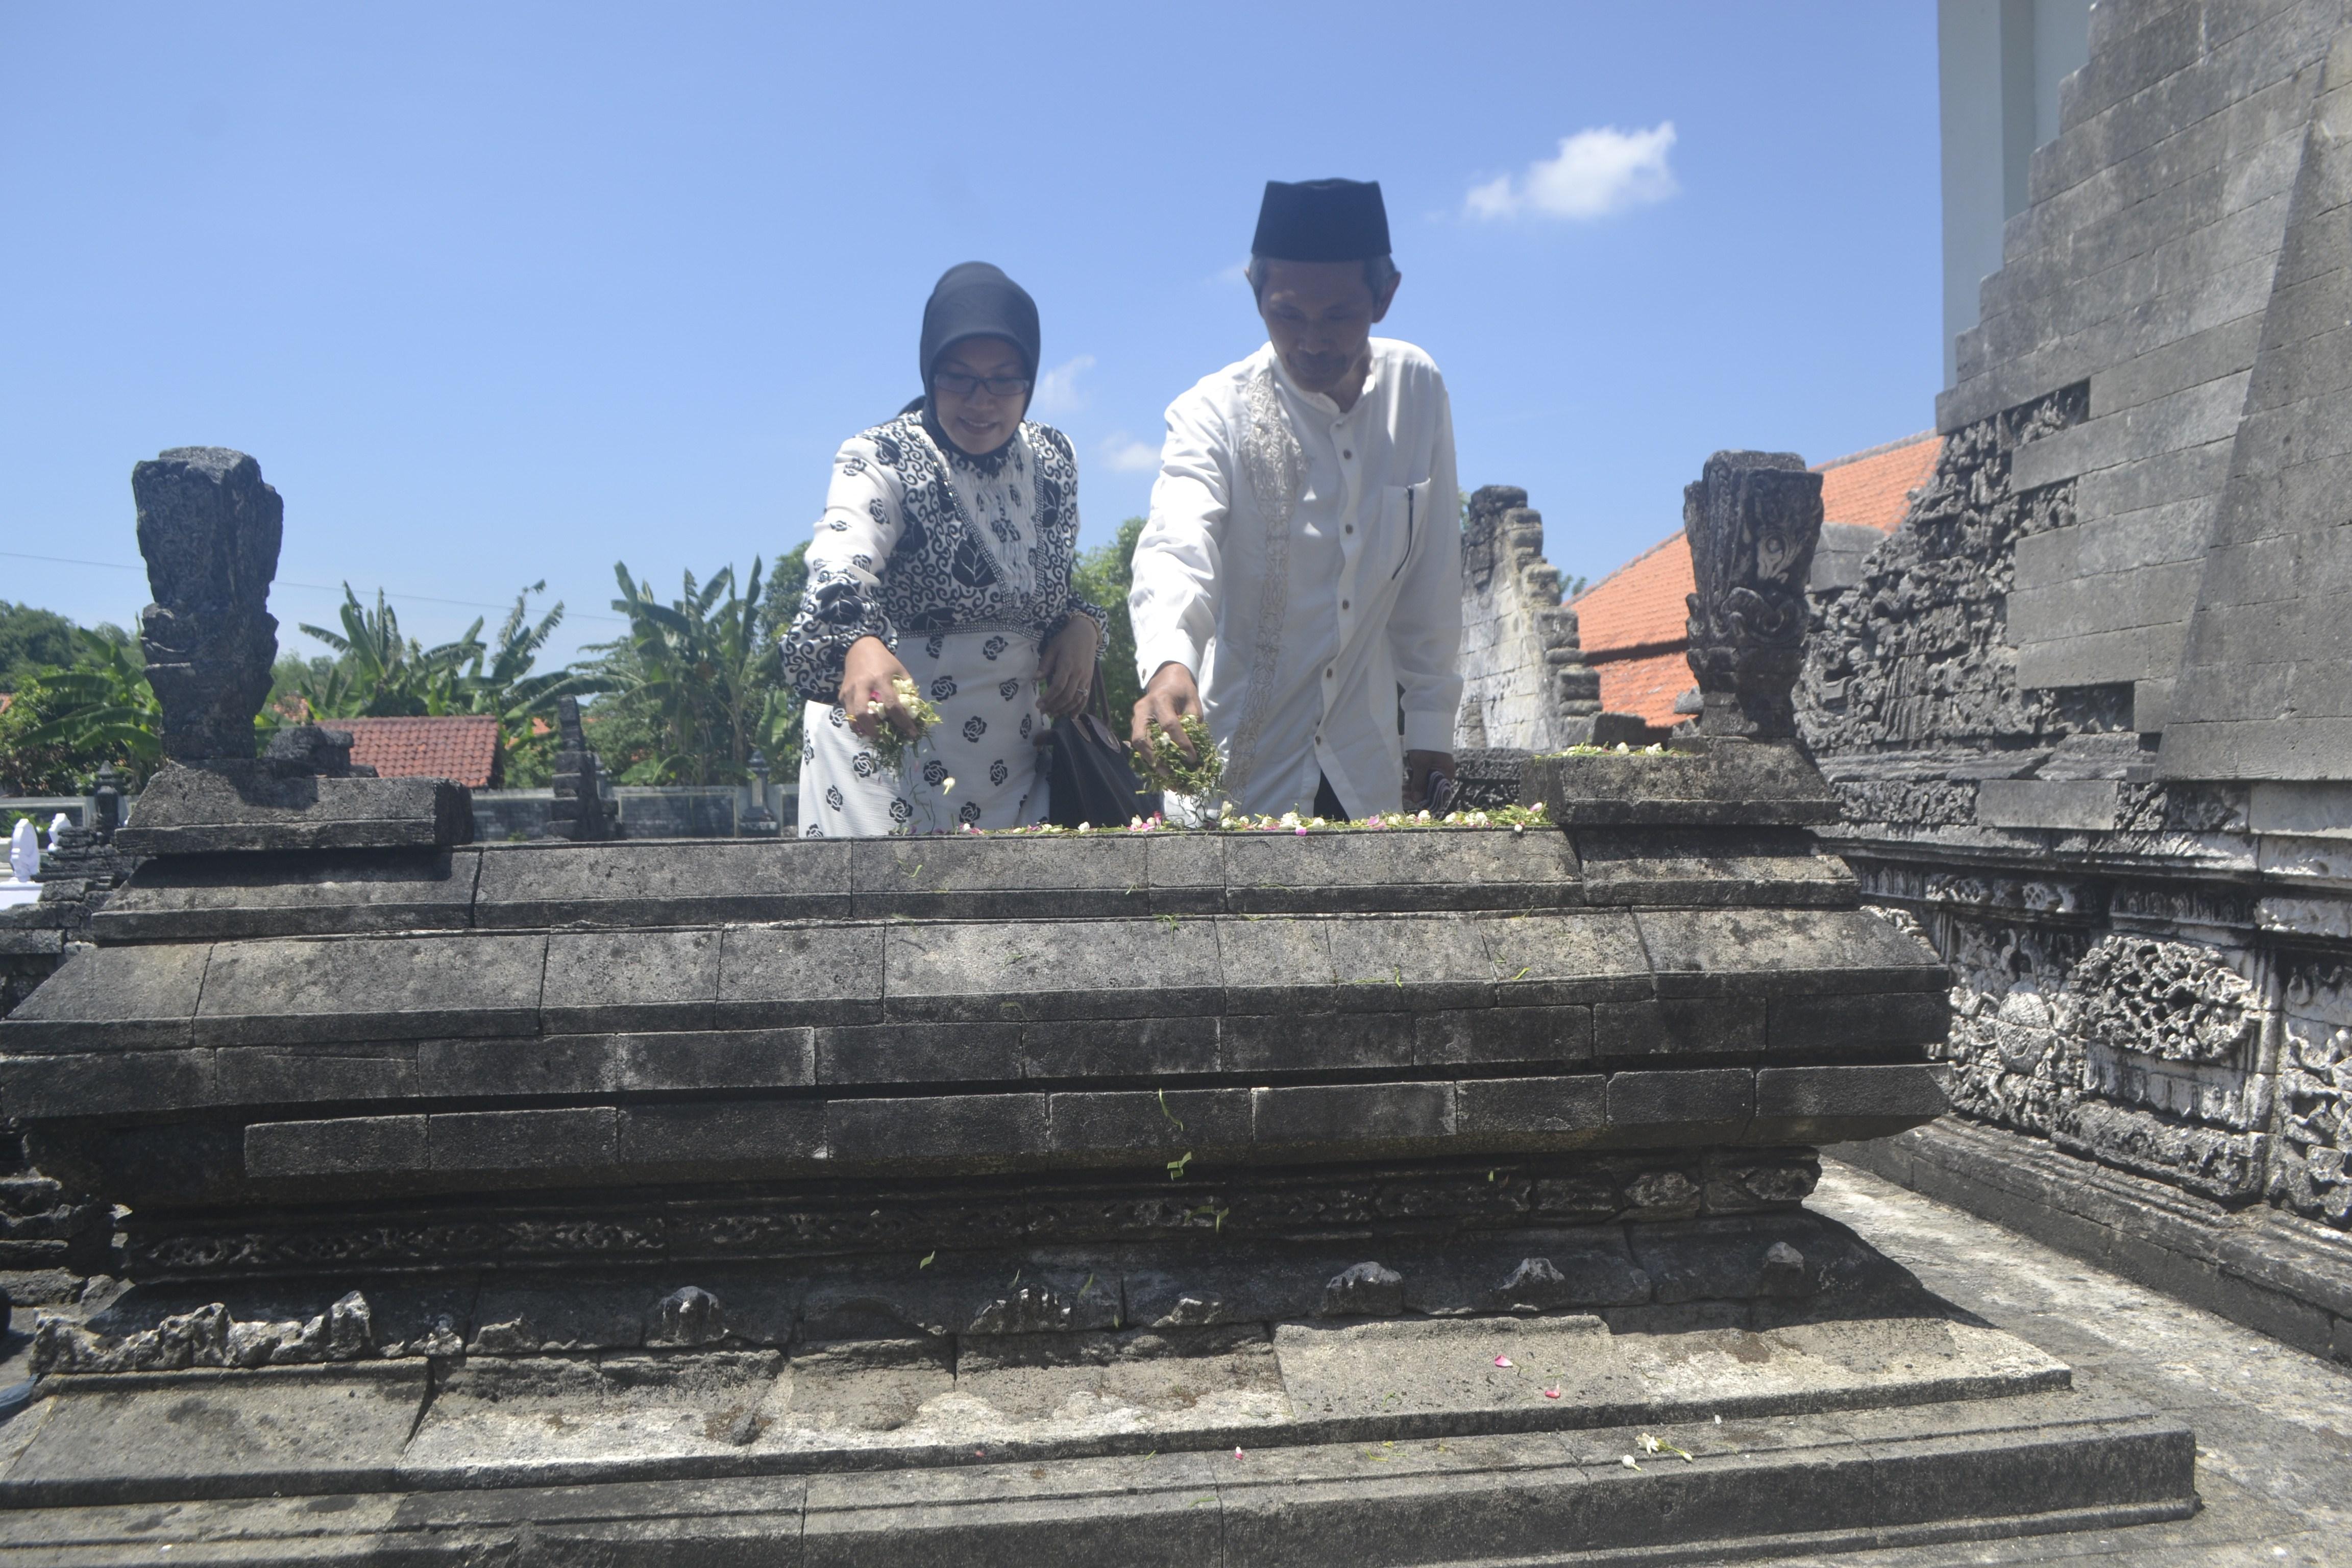 Ziarah Makam Leluhur Rangka Hari Jadi Sampang 393 Monumen Trunojoyo